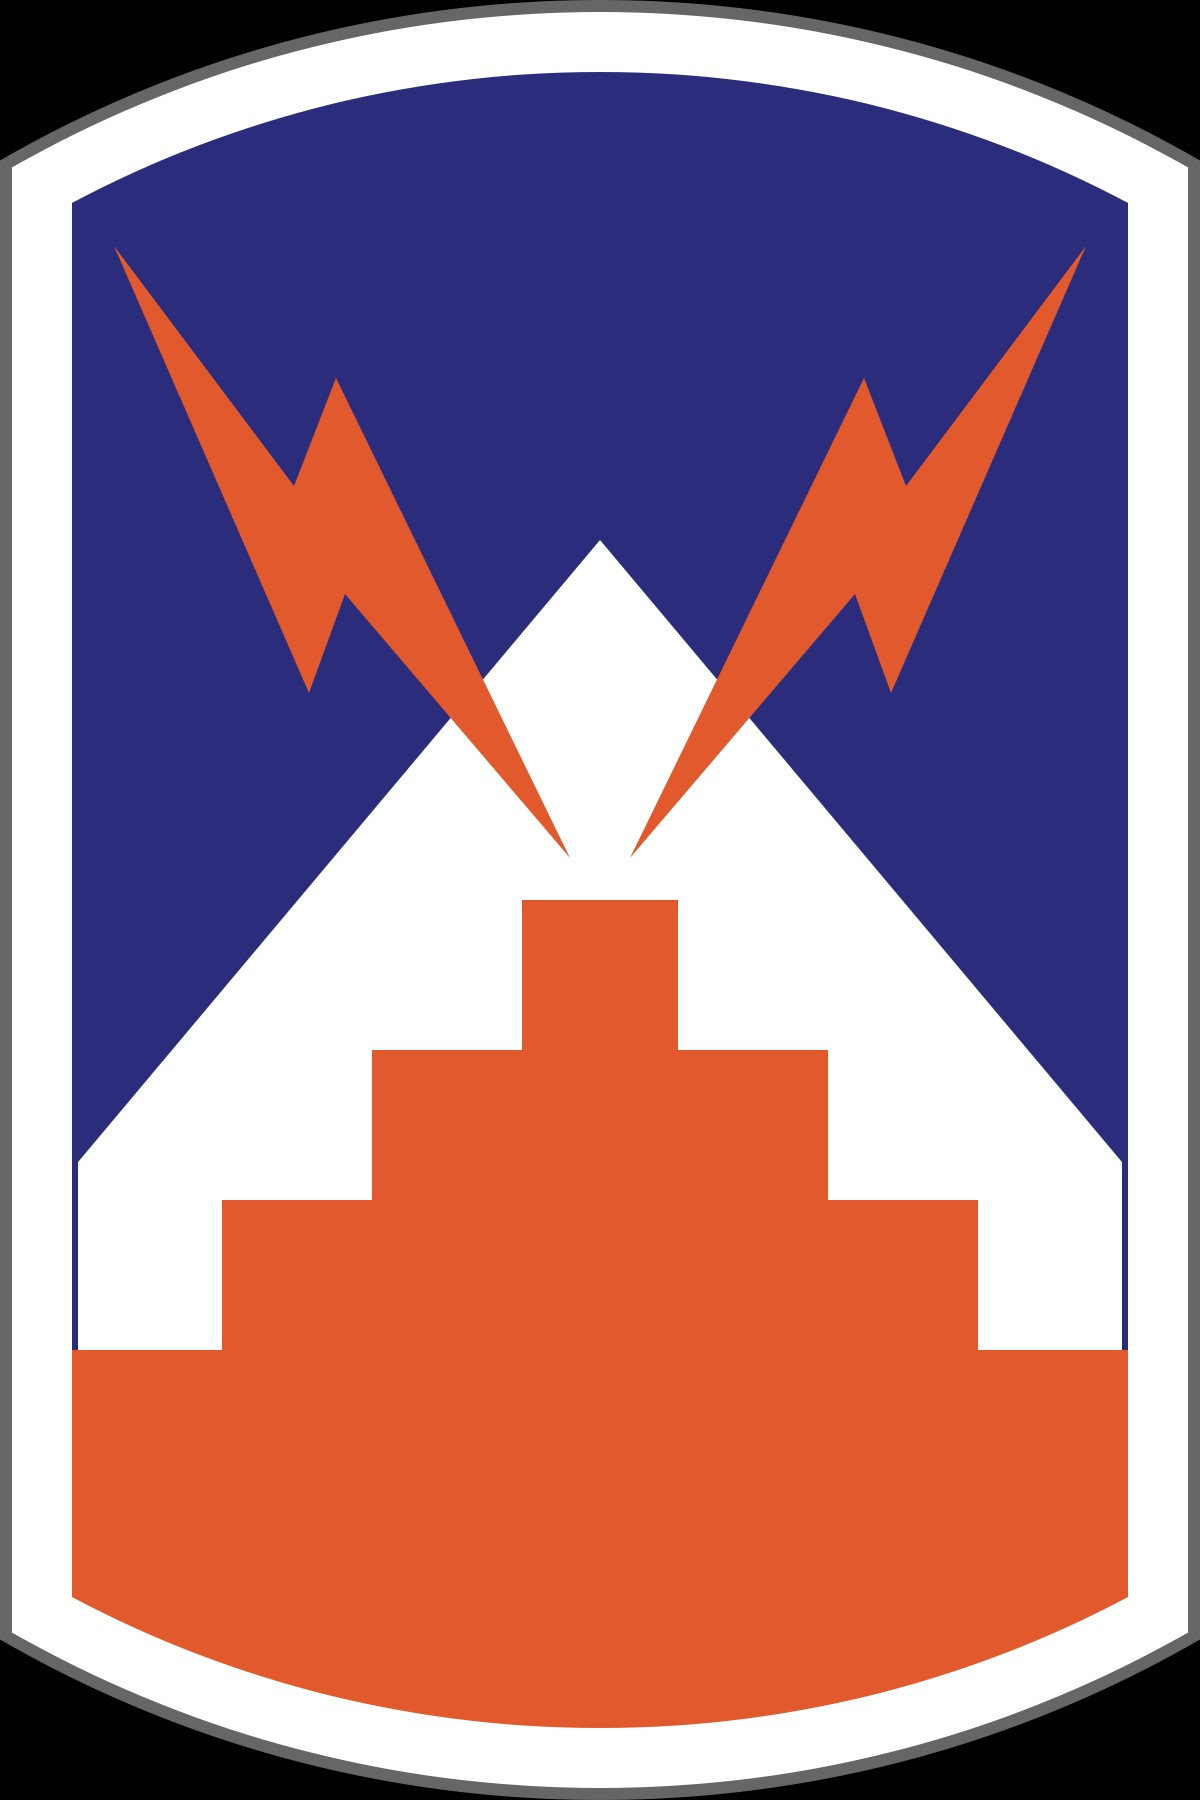 USAREUR 7 Signal Brigade